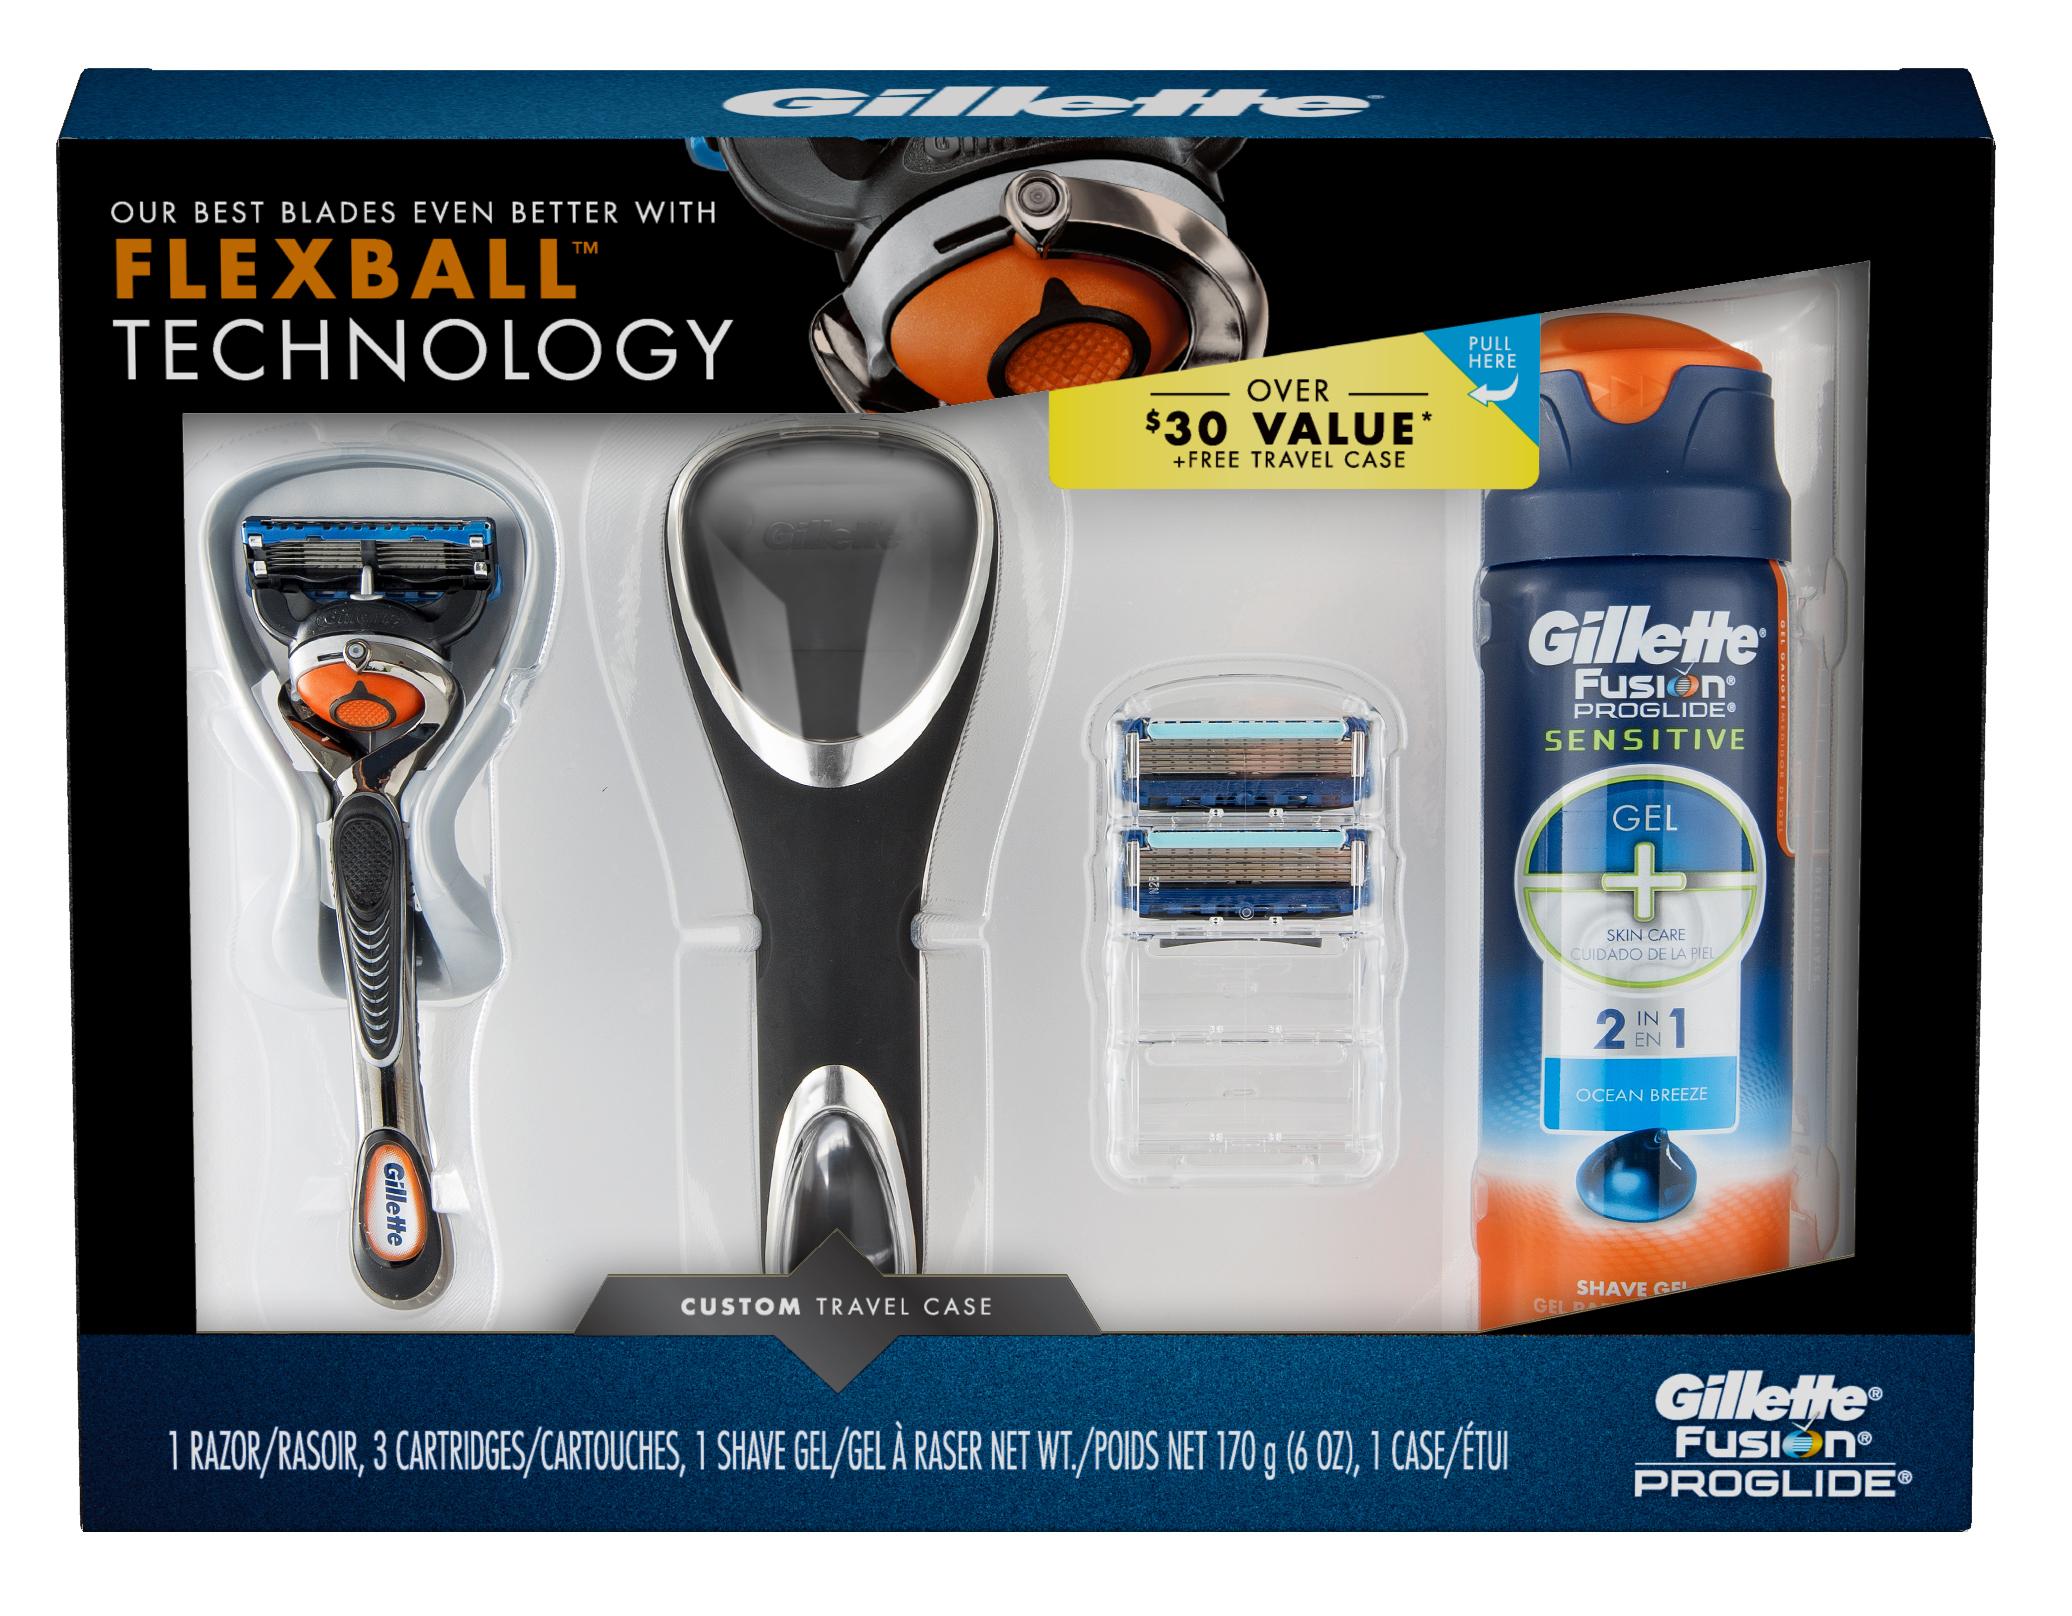 Gillette fusion proglide manual razor with flexball technology -  Img